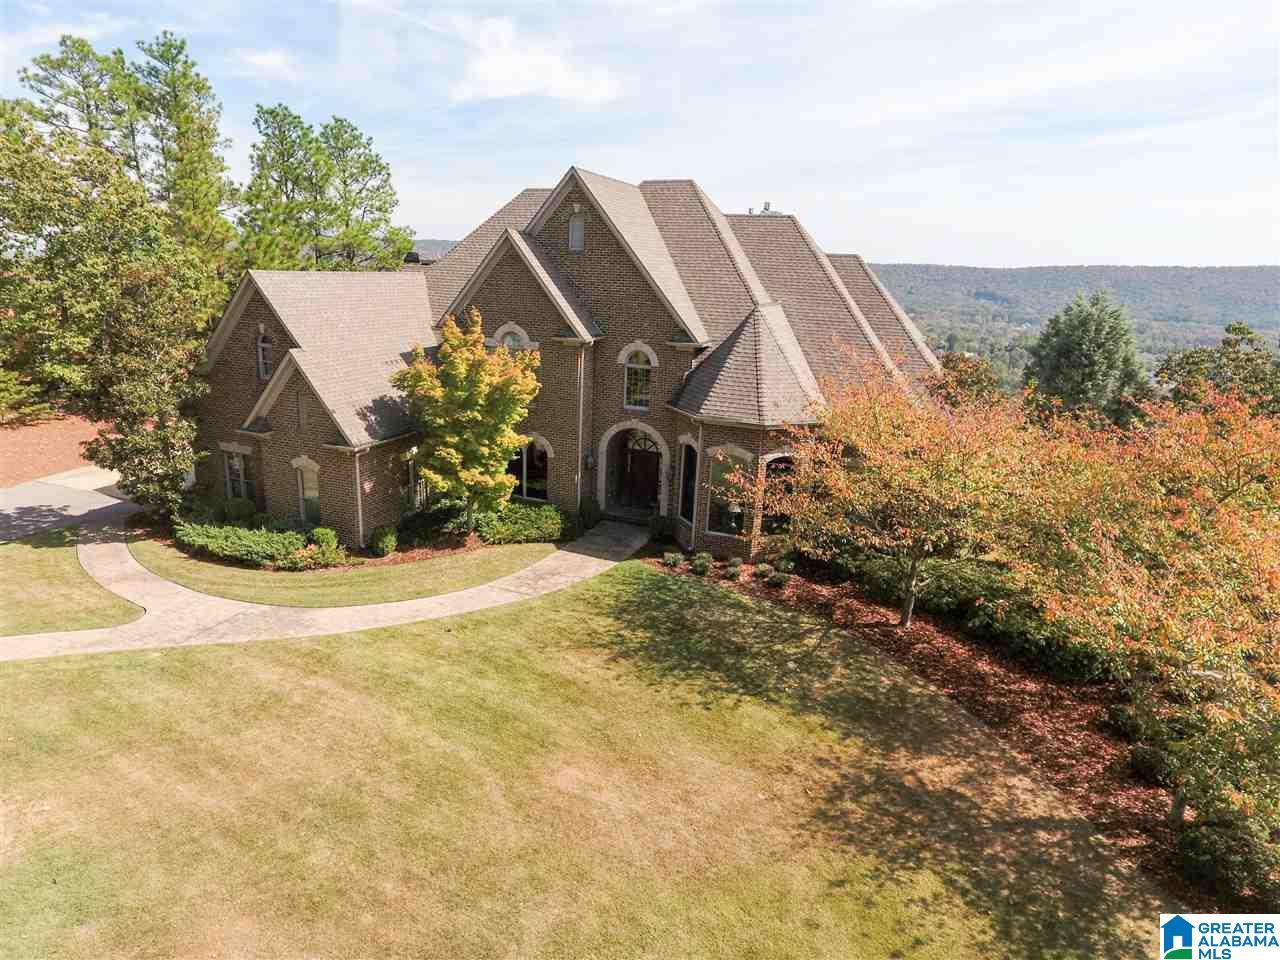 Birmingham AL Homes For Sale - Zillow: Real Estate ...